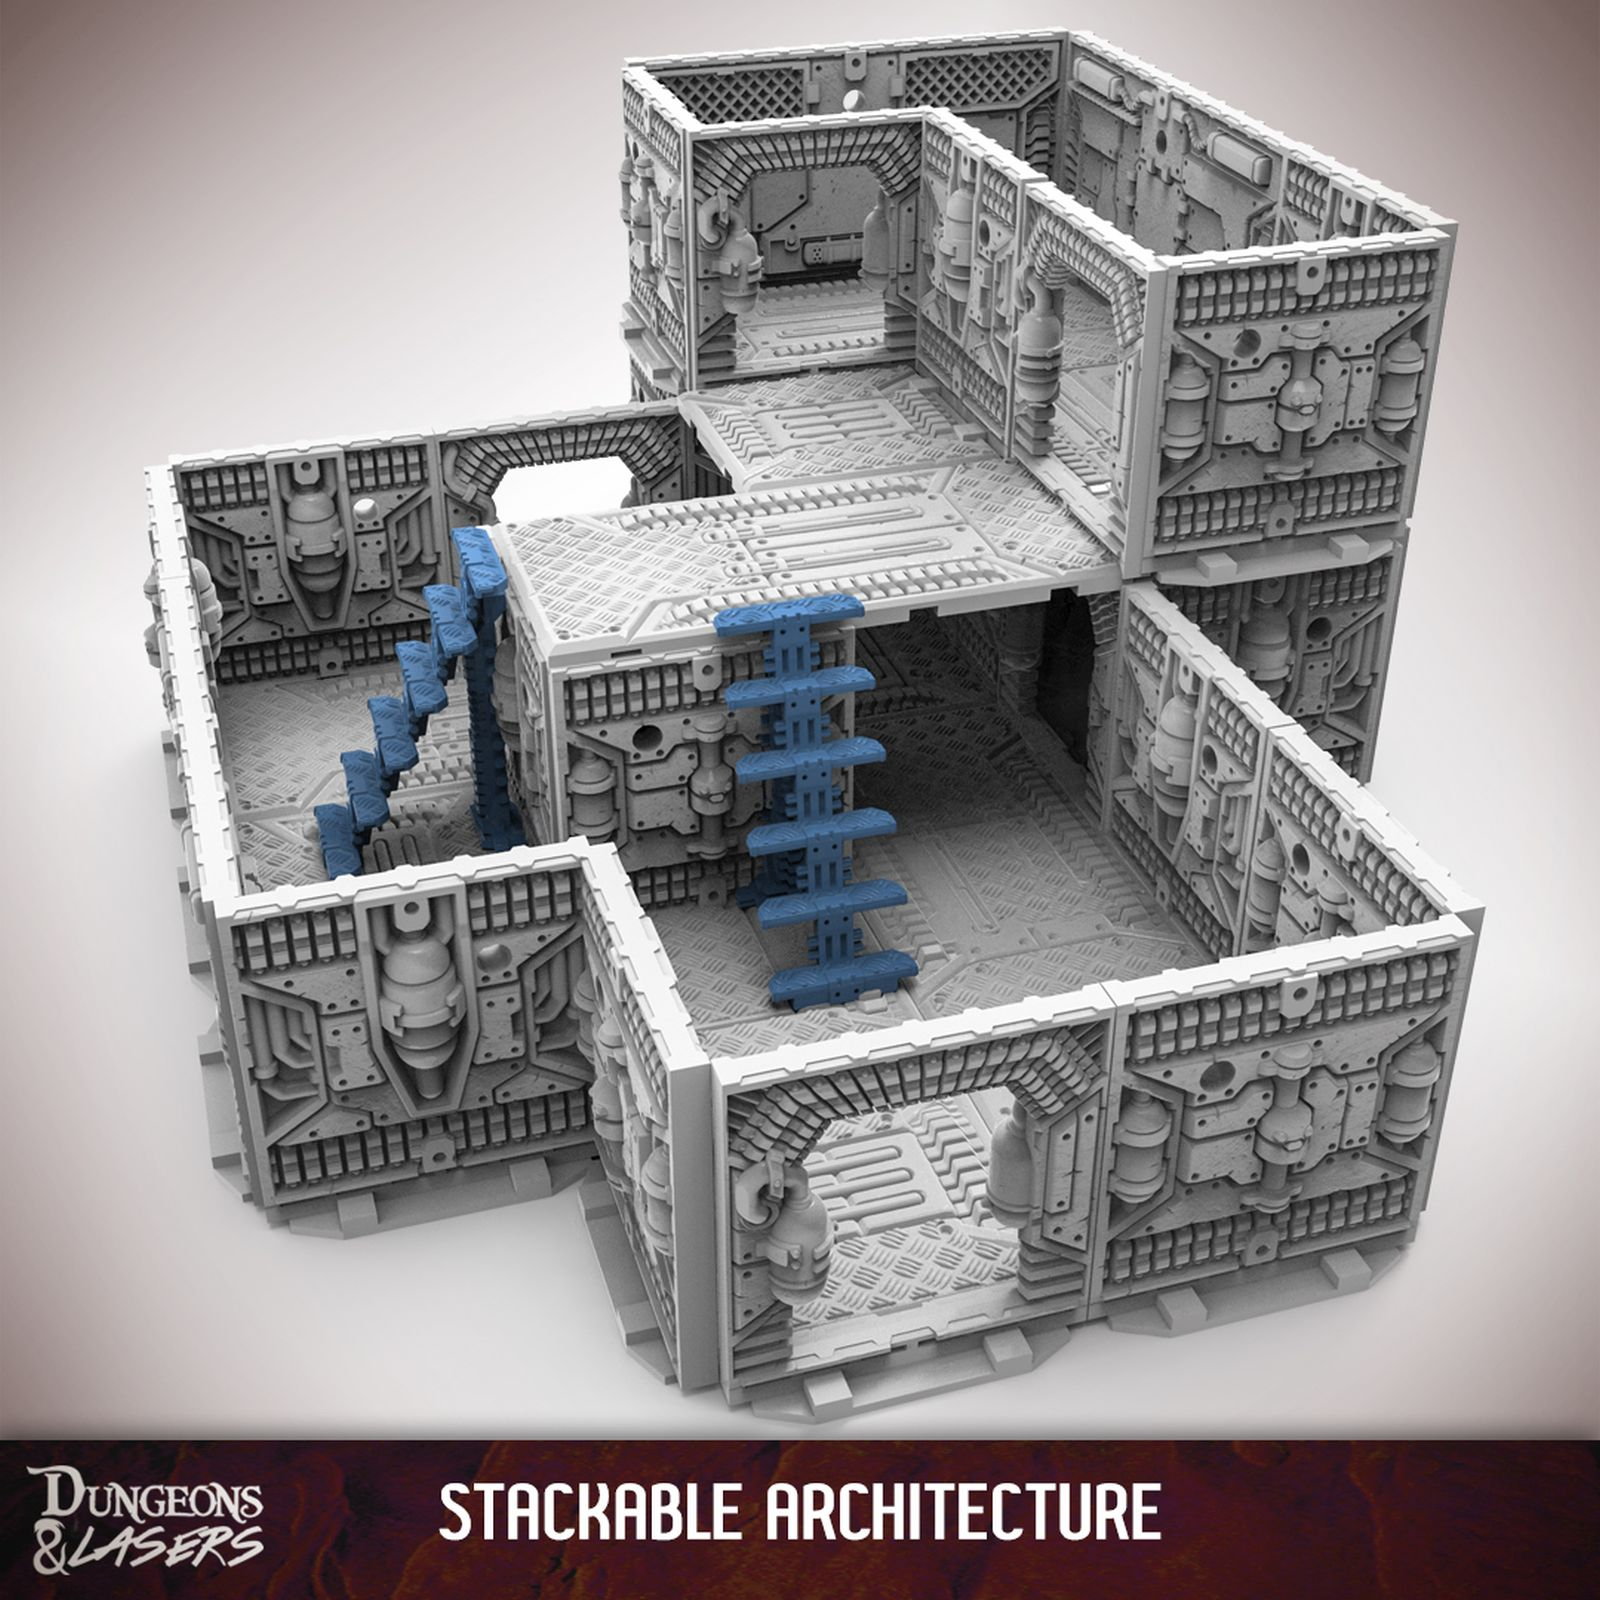 D&L - 1x1 - stackable architecture sci-fi.jpg